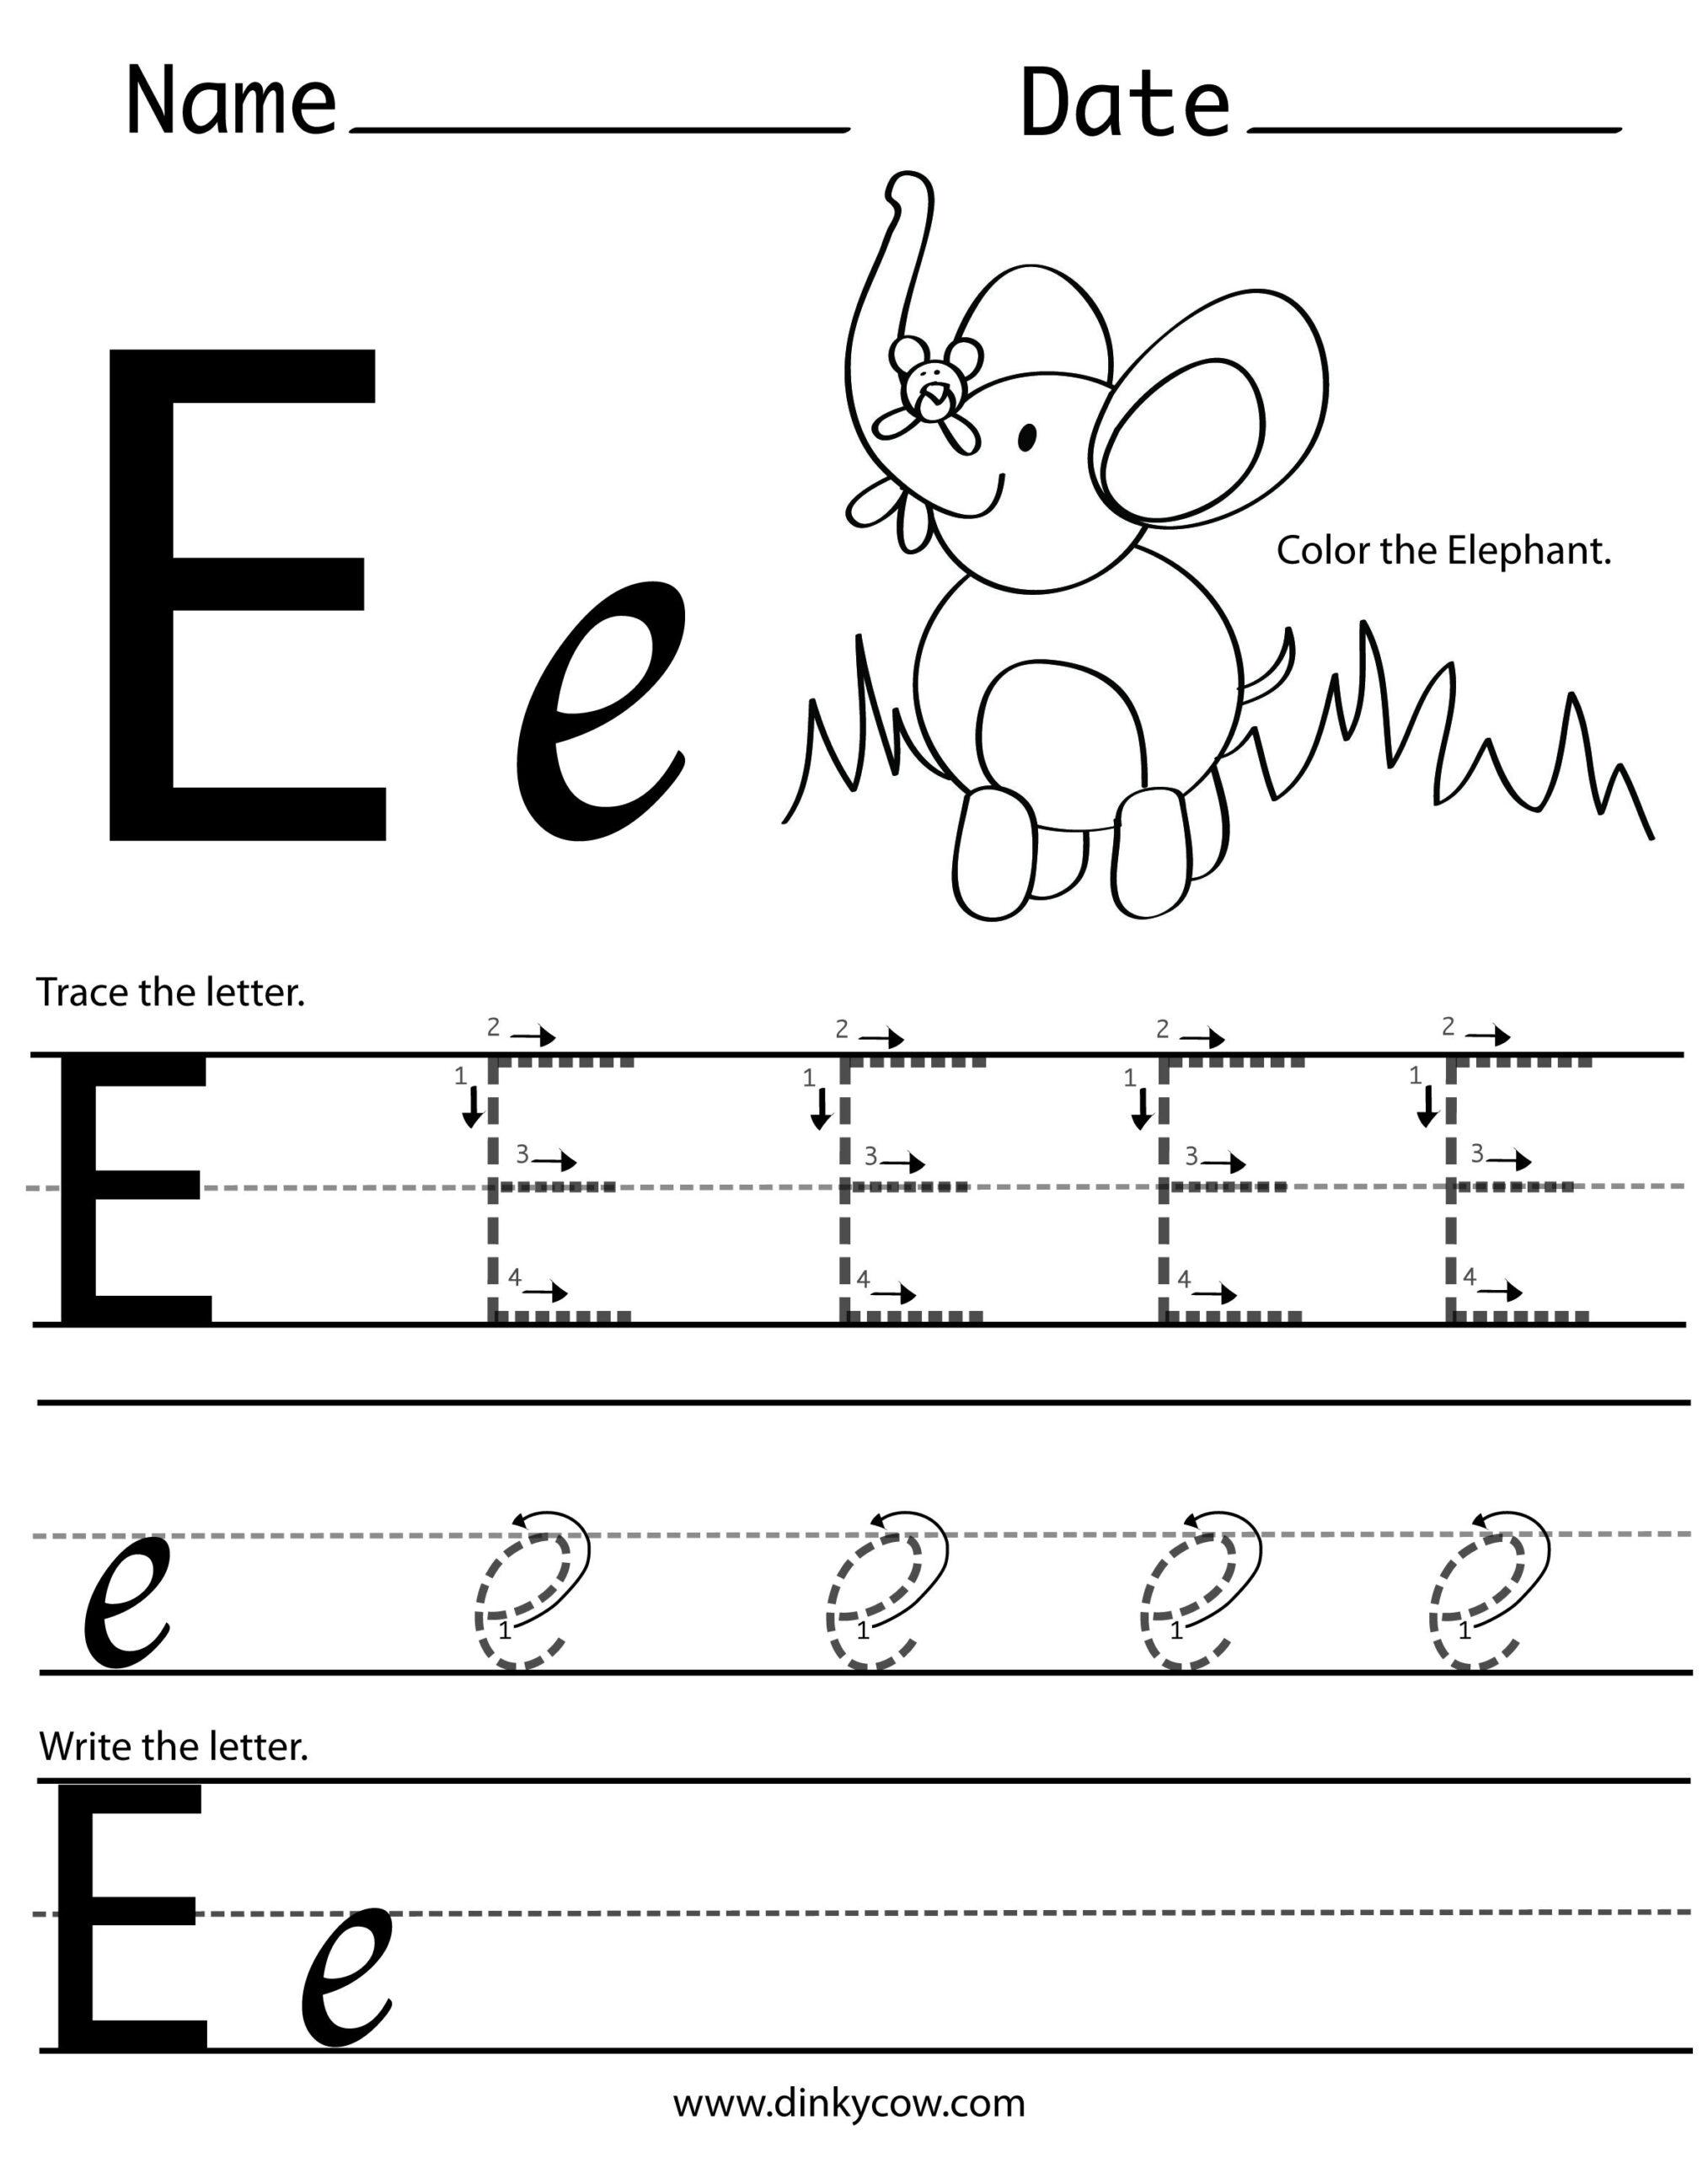 Worksheets Letter E Worksheets For Preschool Opossumsoft regarding Letter E Worksheets Tracing